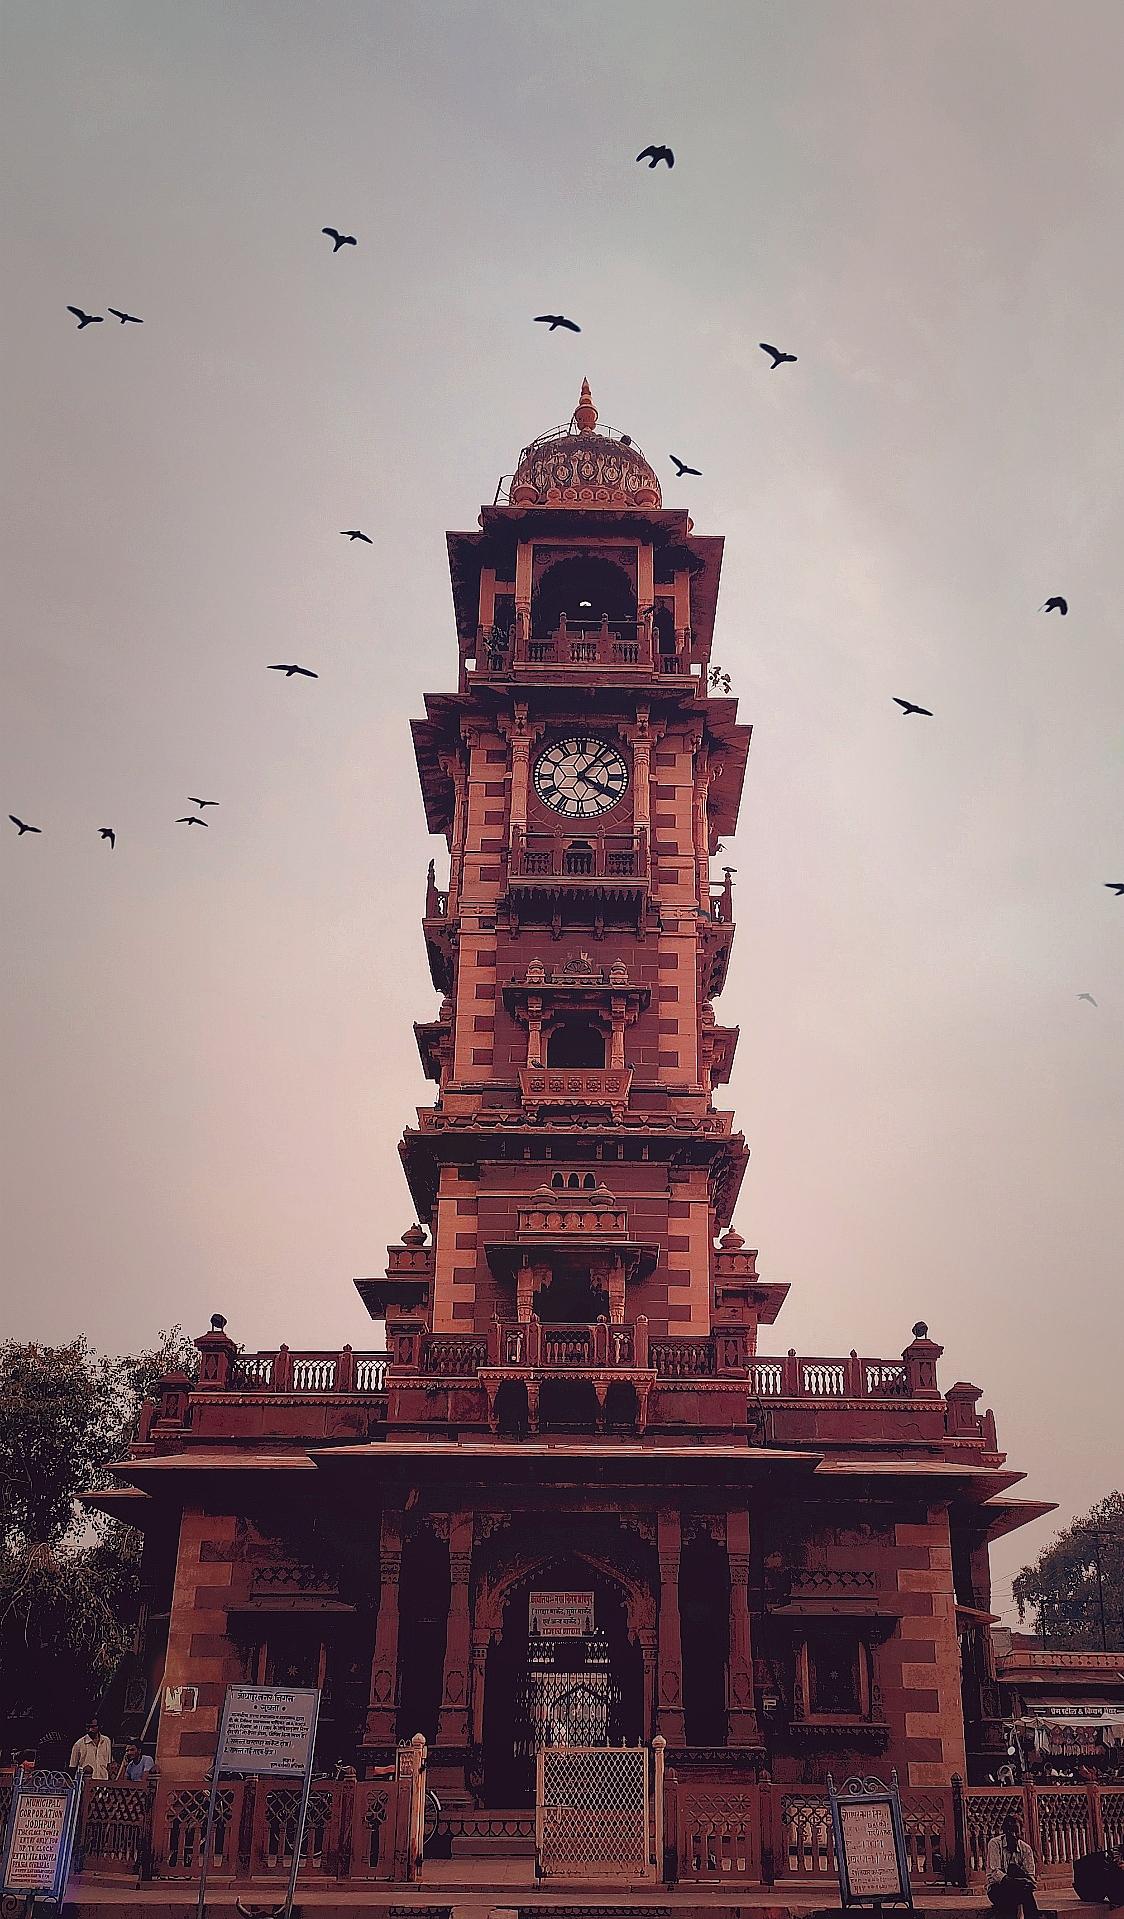 Ghanta ghar ancient architecture